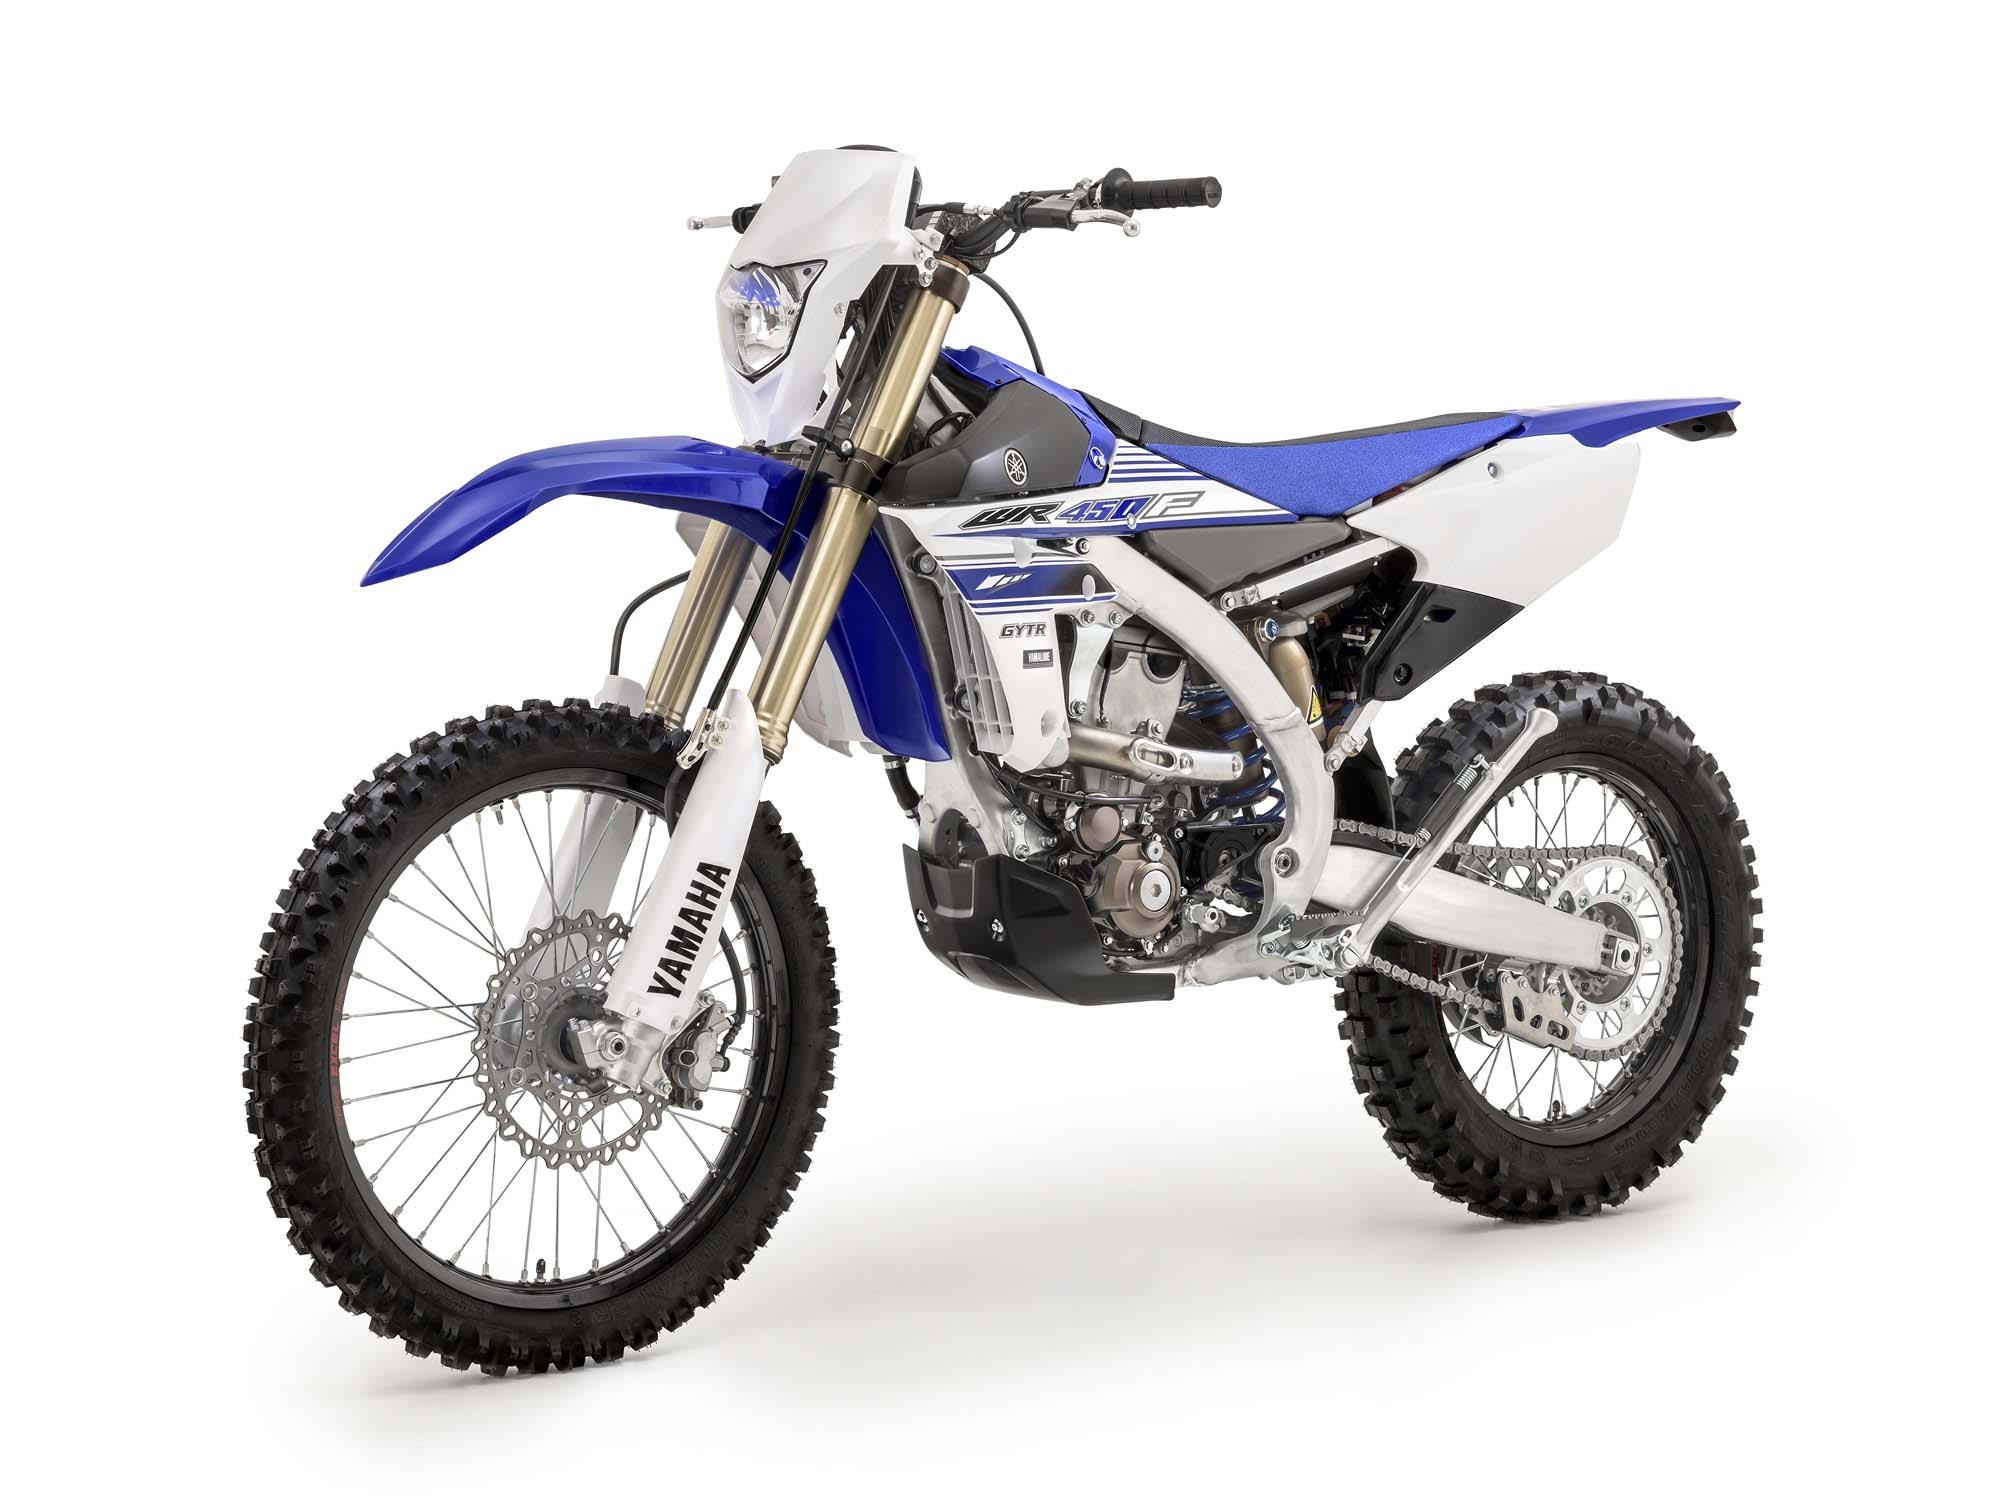 Yamaha WR 450 F - Alle technischen Daten zum Modell WR 450